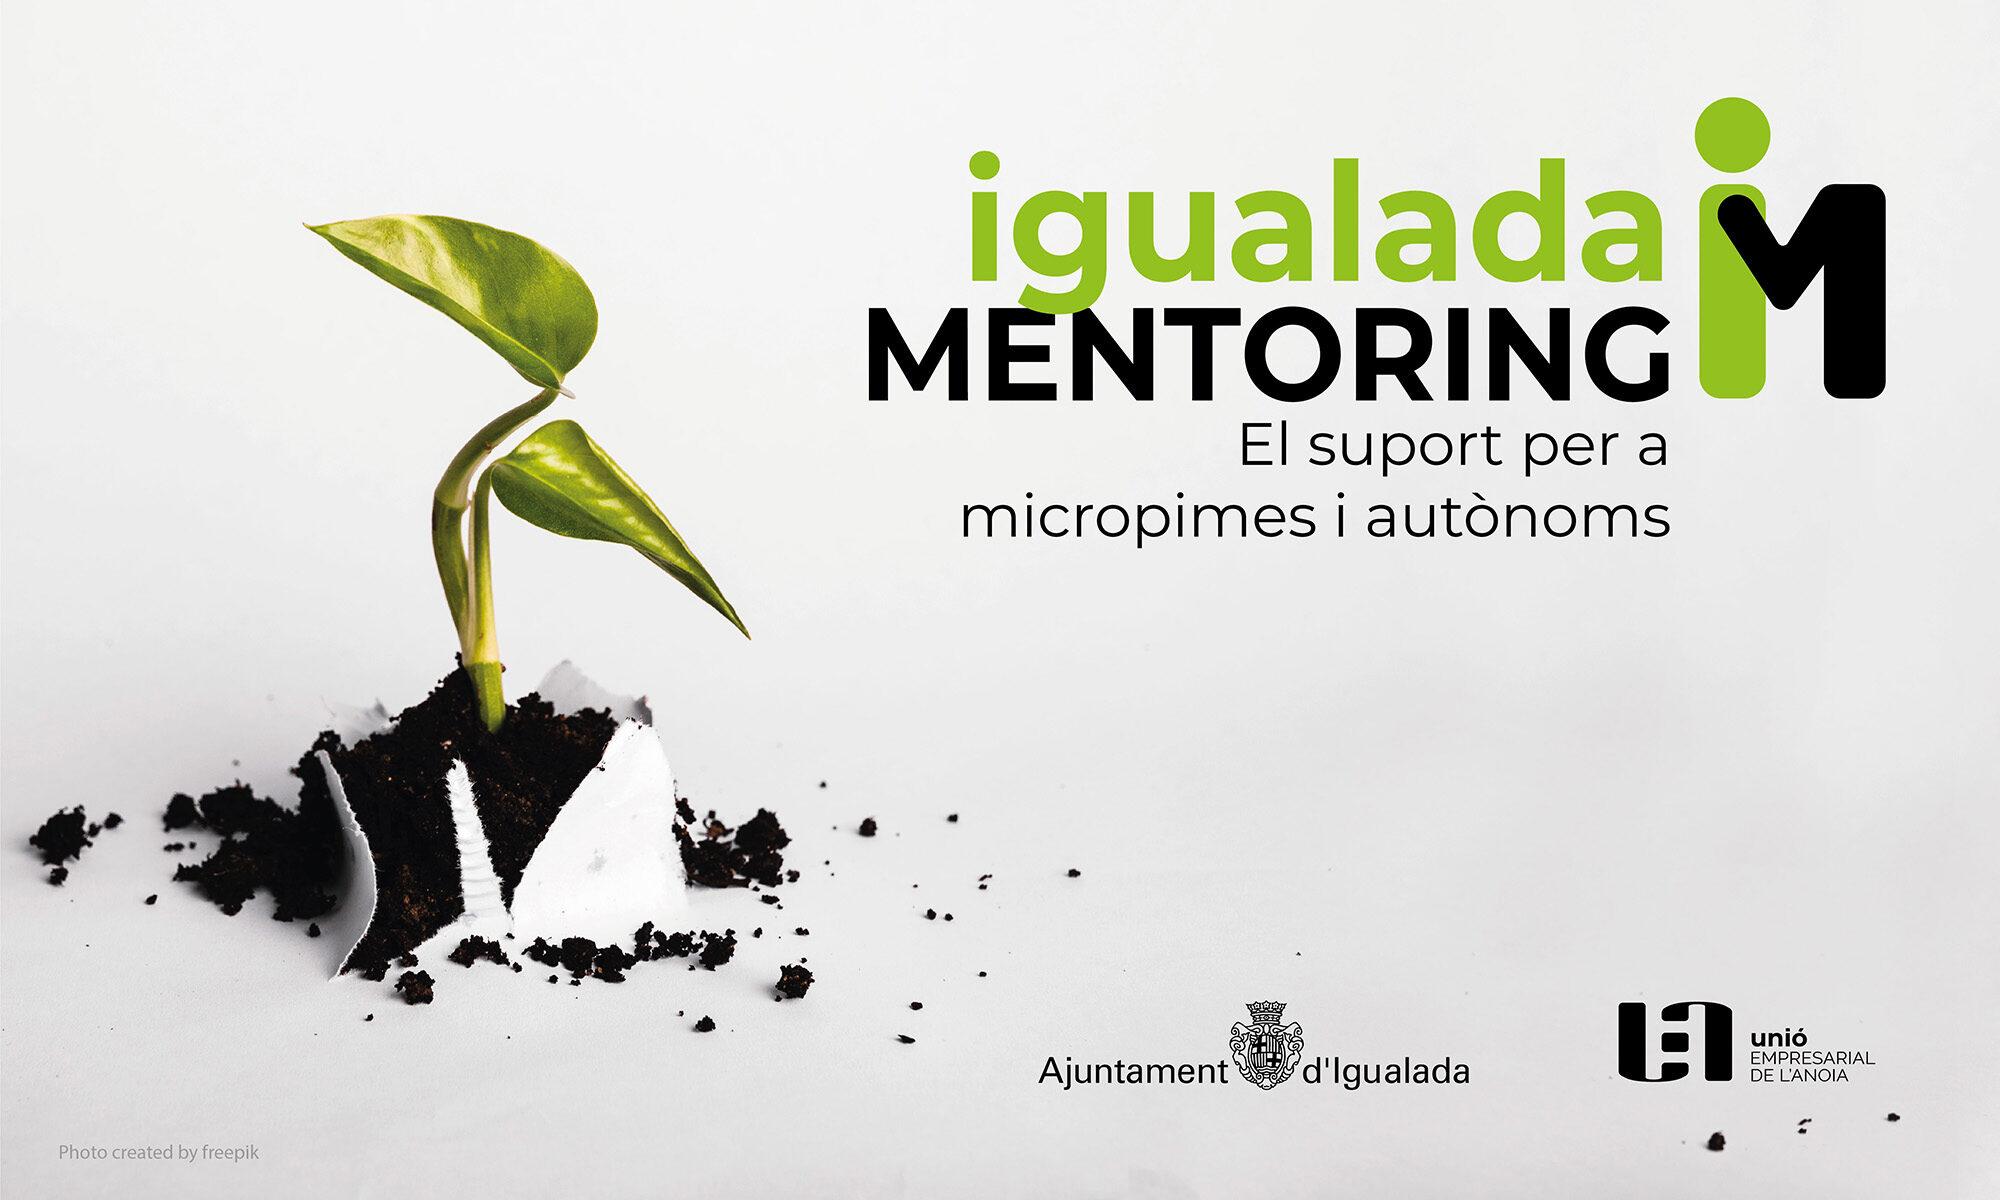 Igualada Mentoring